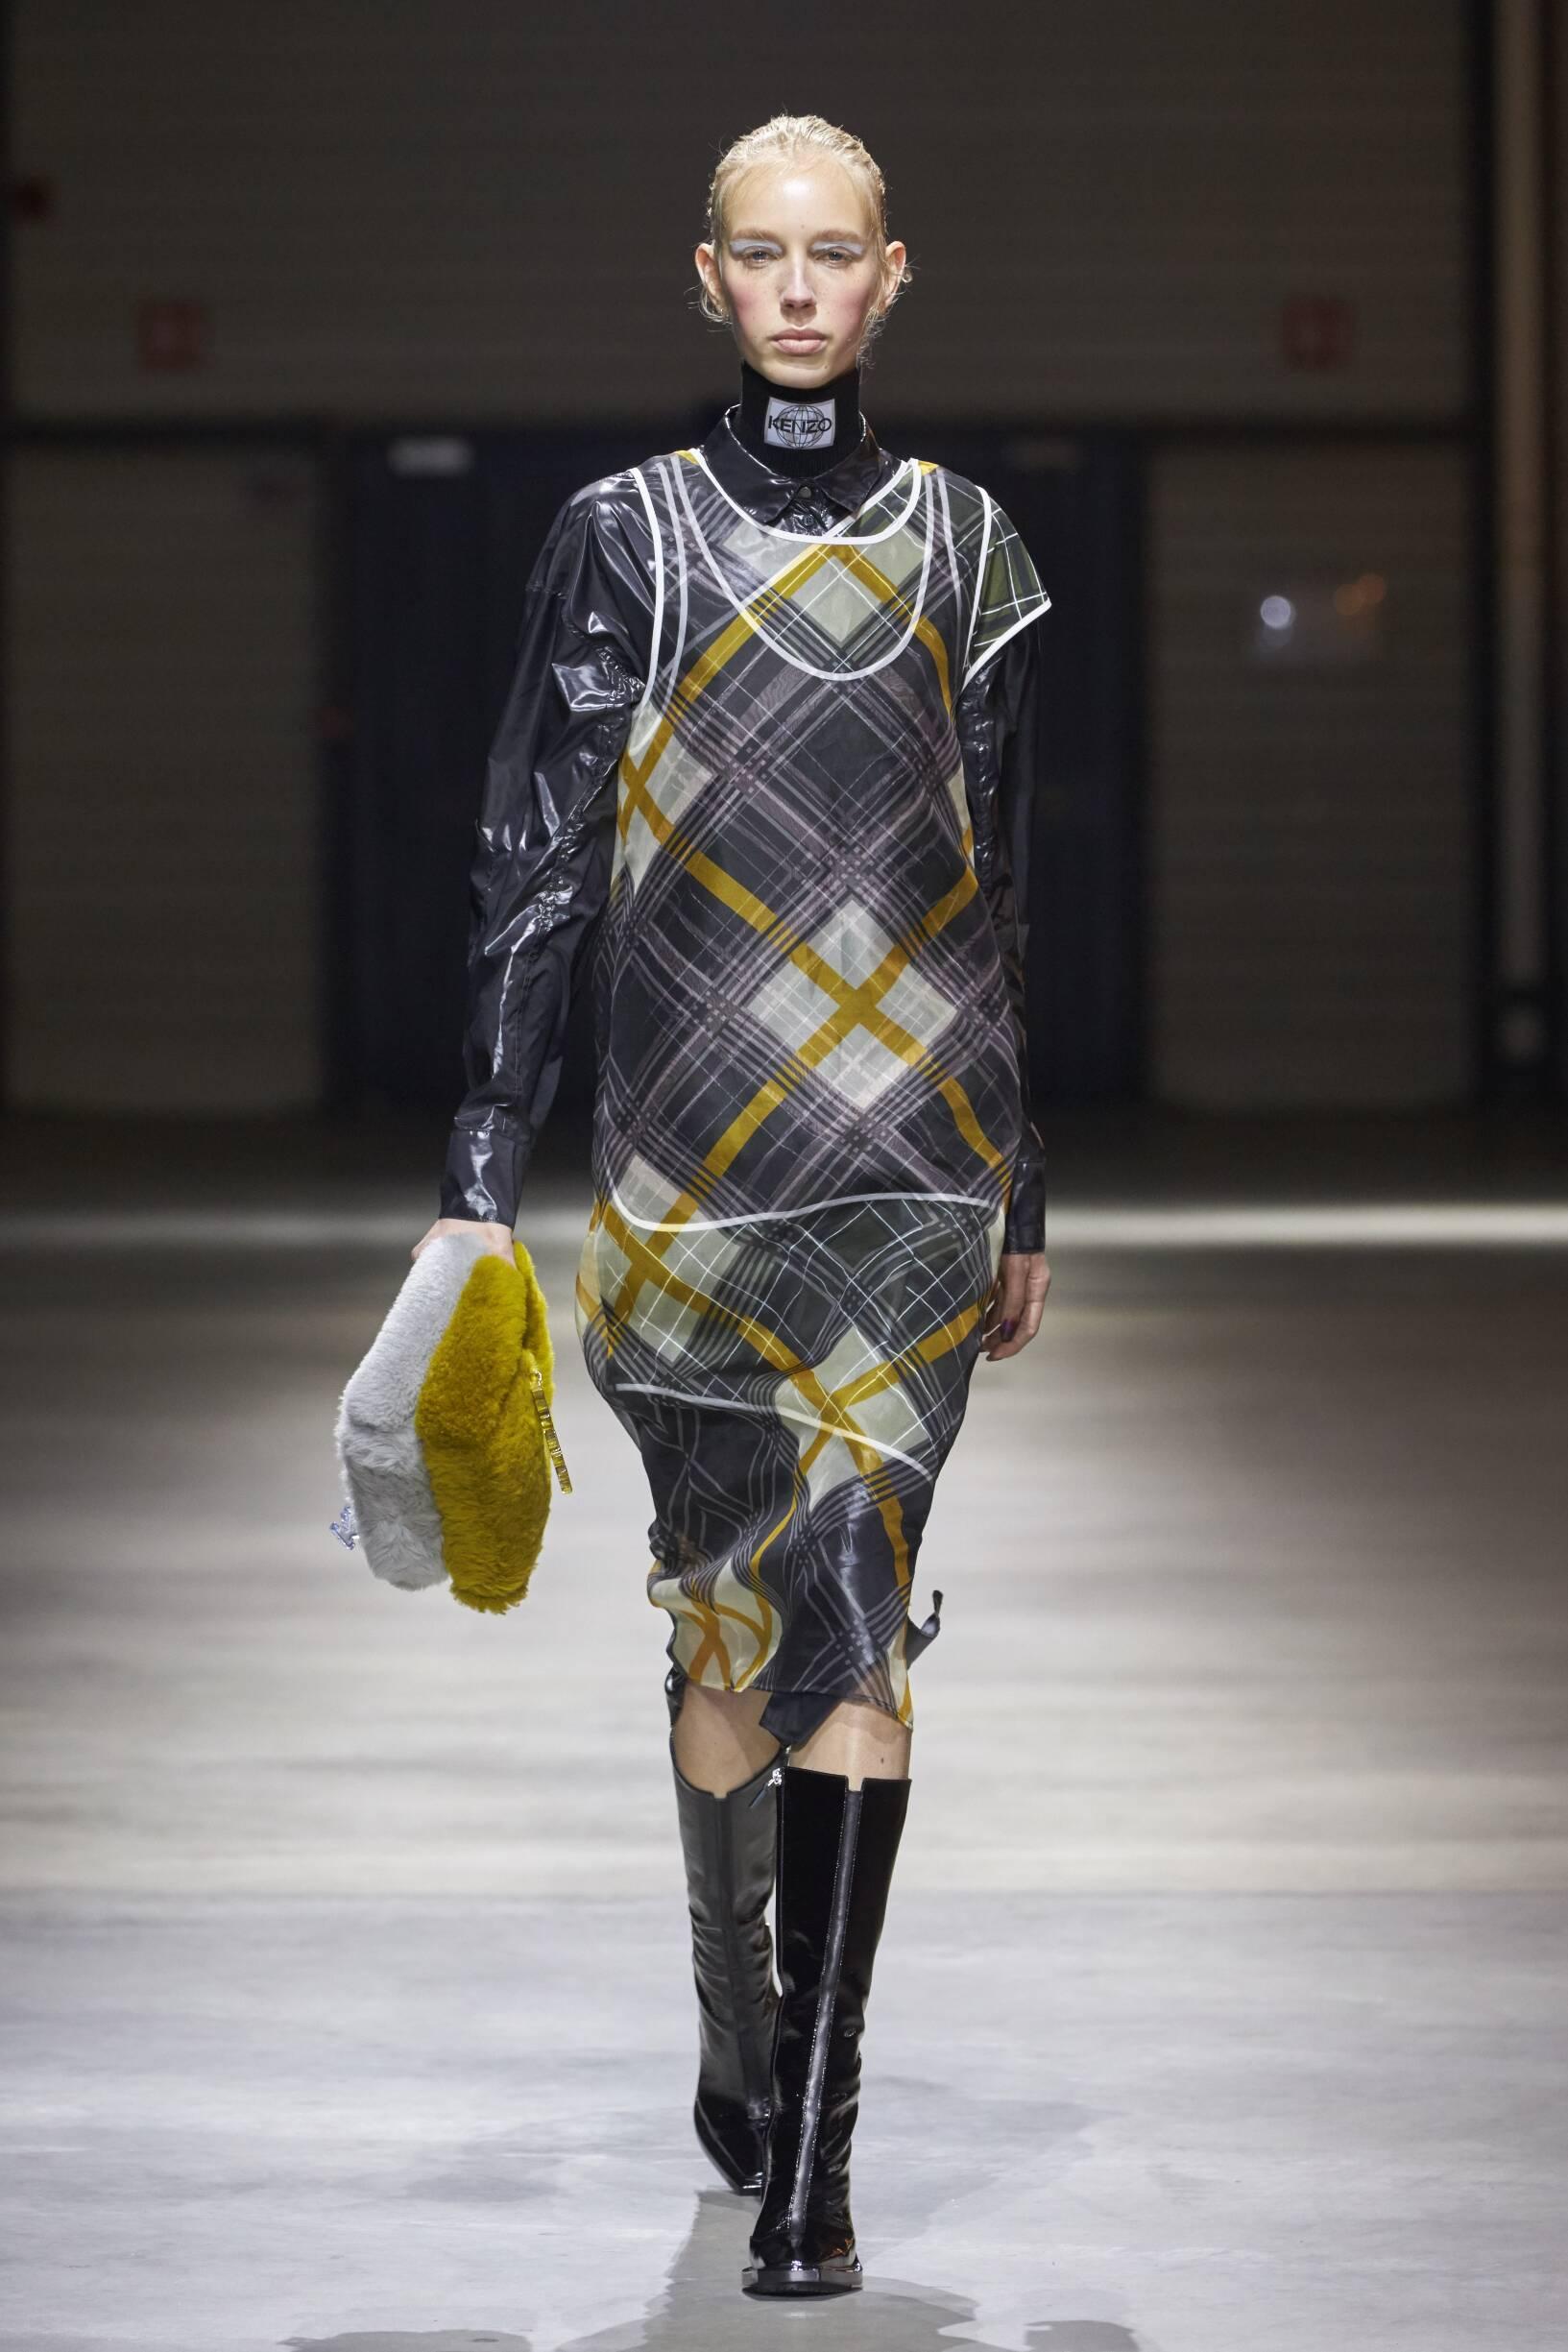 2017 Catwalk Kenzo Woman Fashion Show Winter